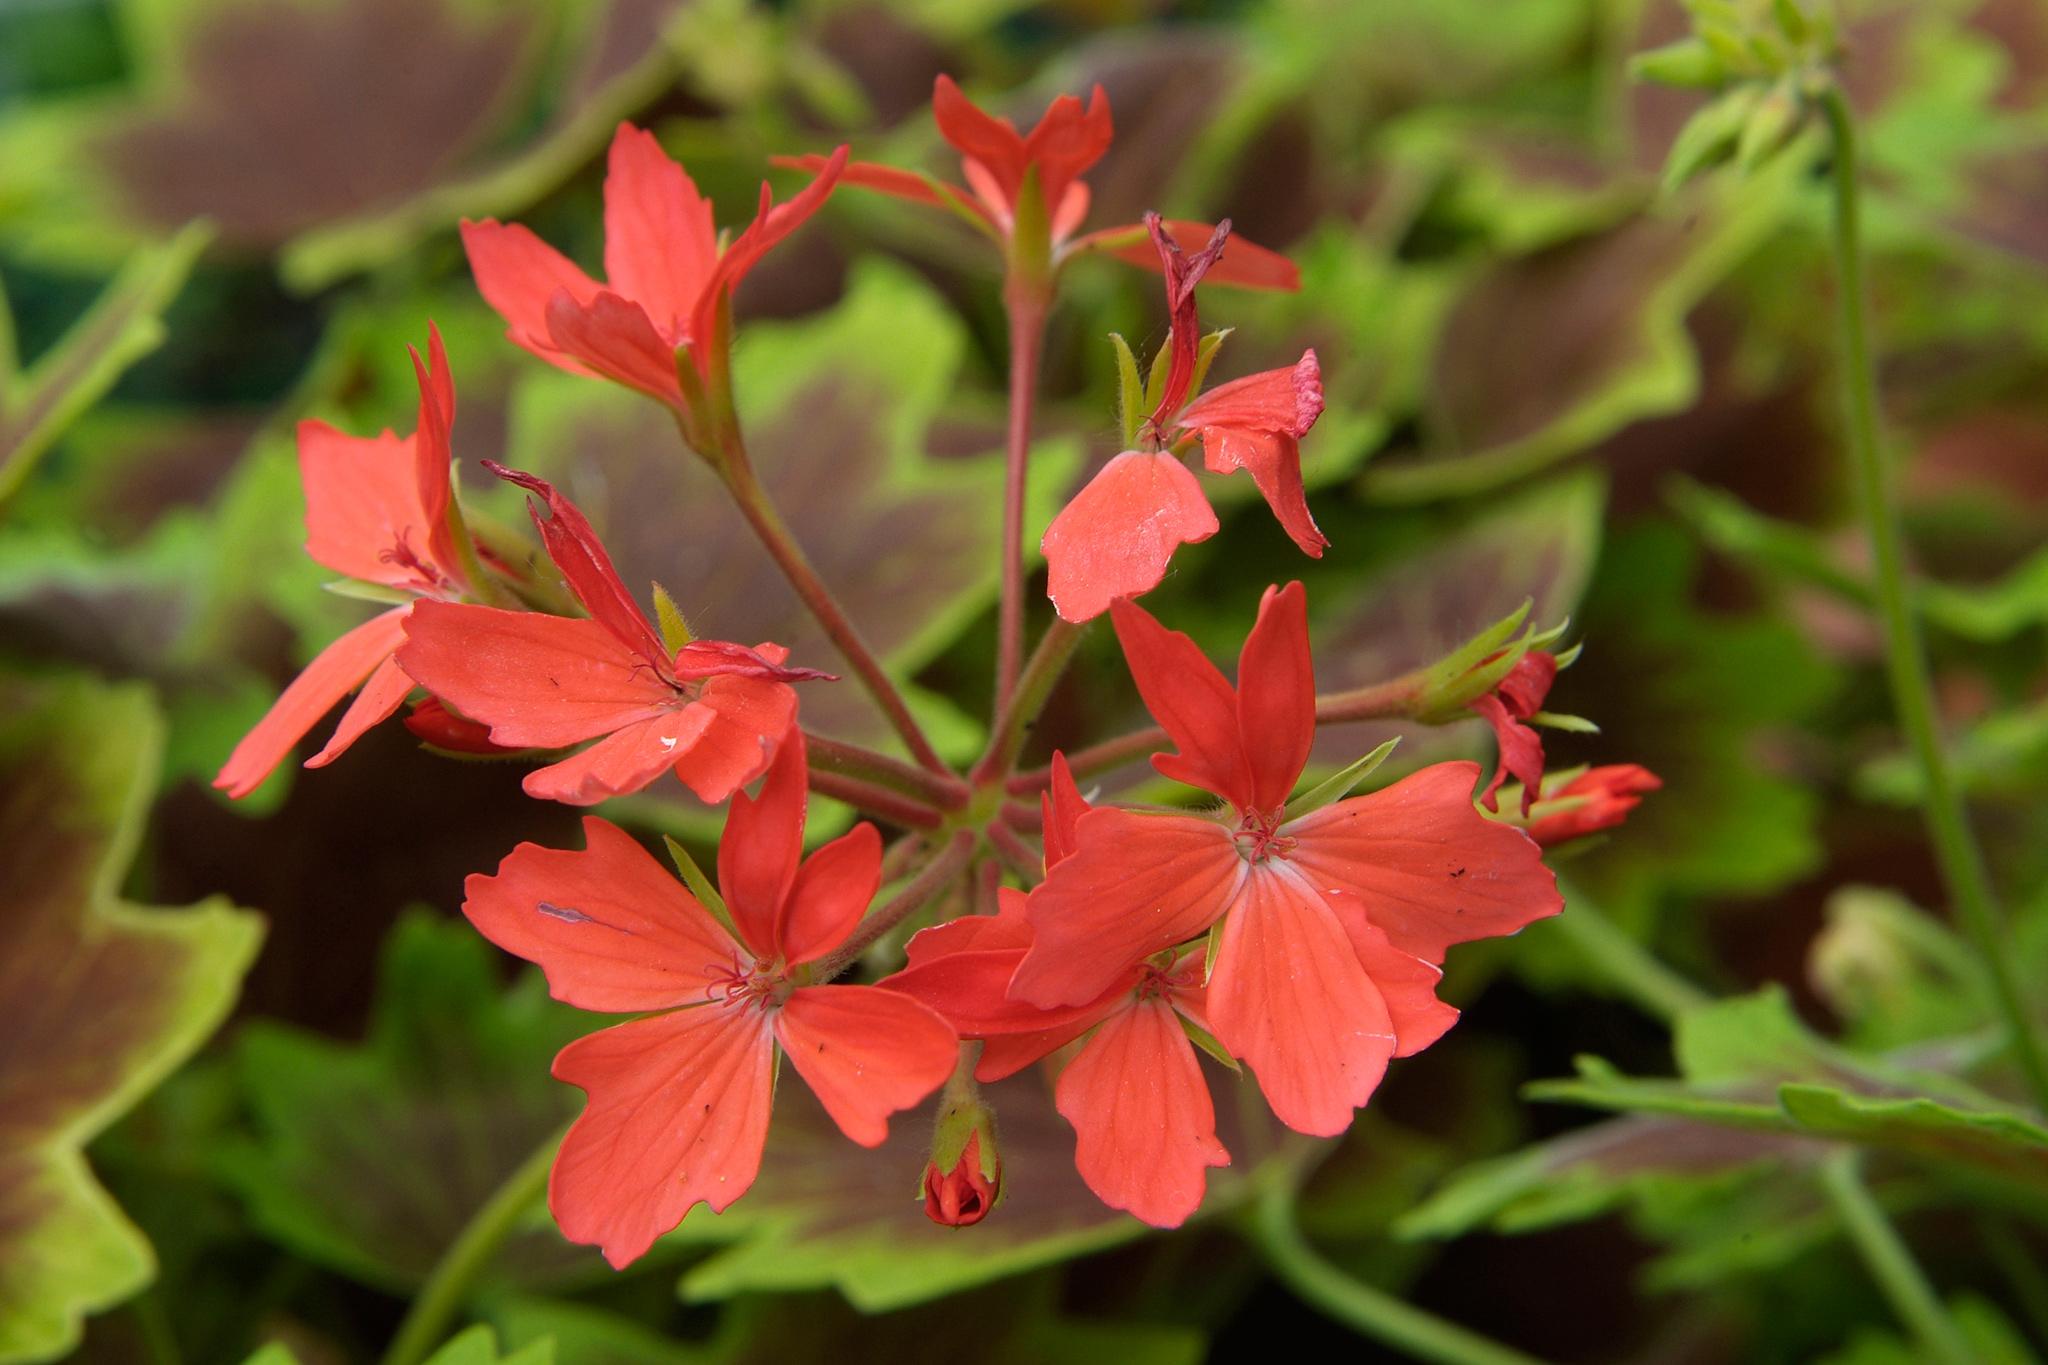 pelargonium-vancouver-centennial-2